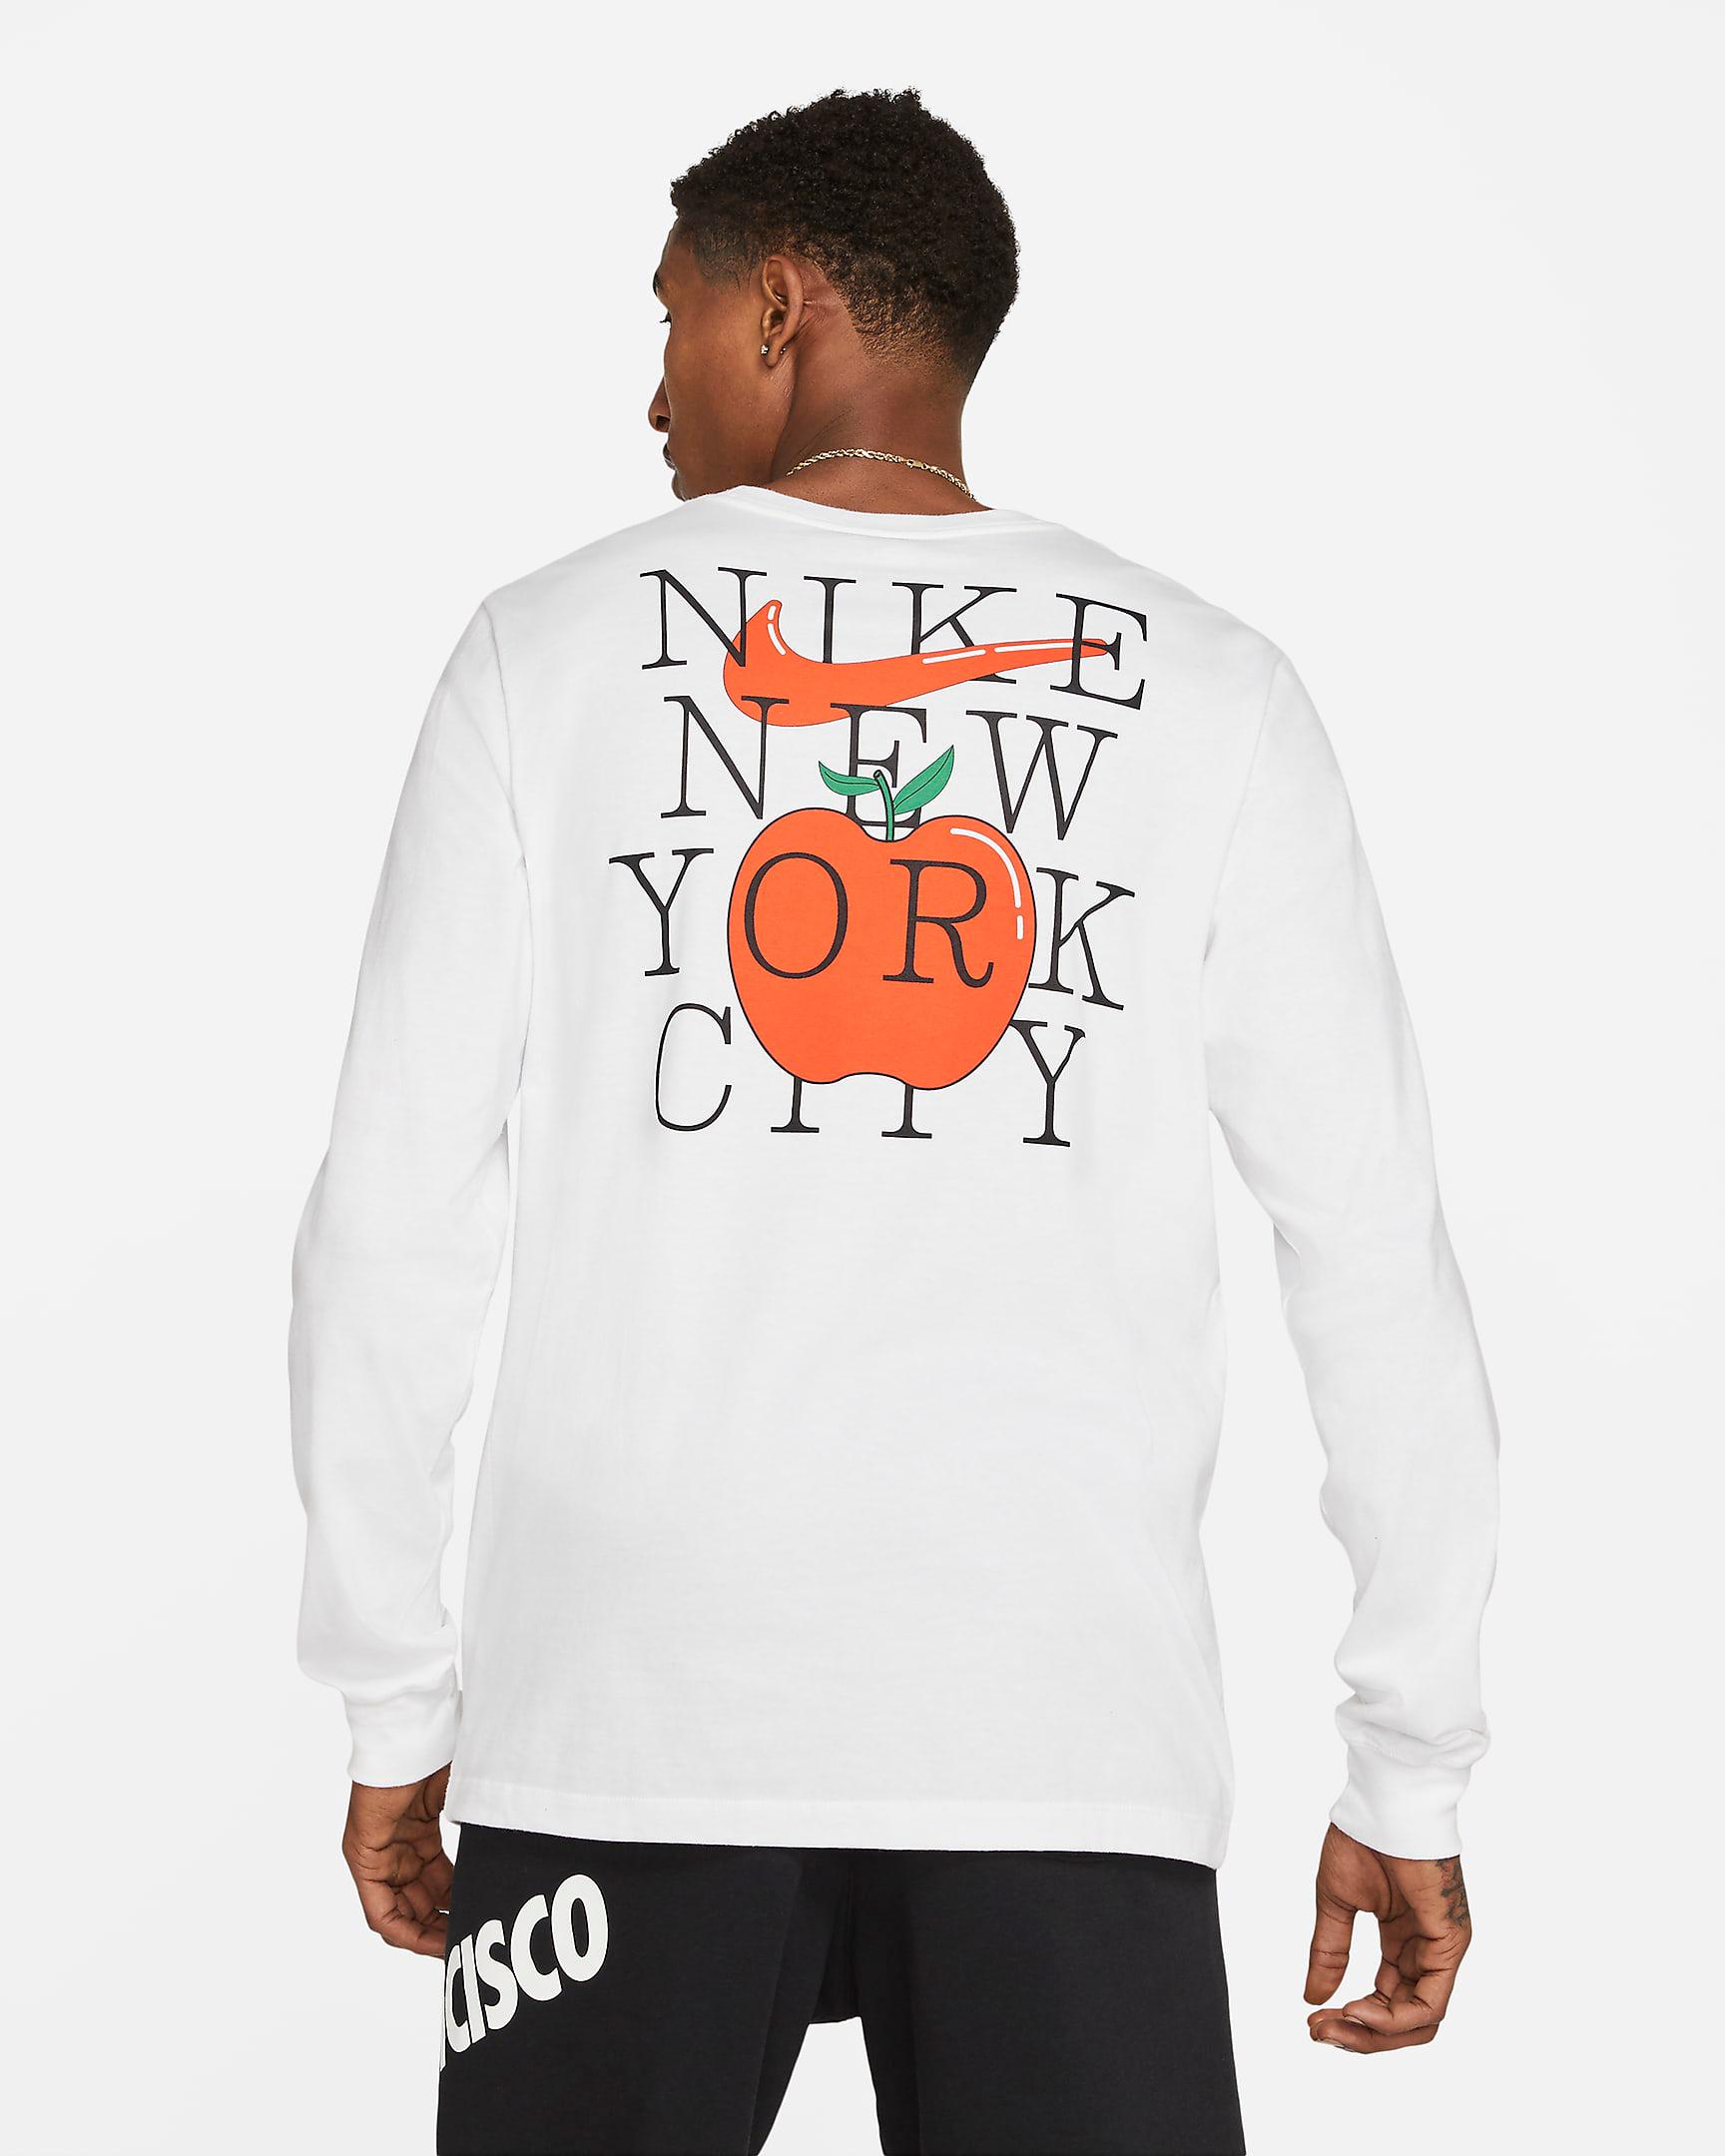 nike-sportswear-nyc-big-apple-shirt-2